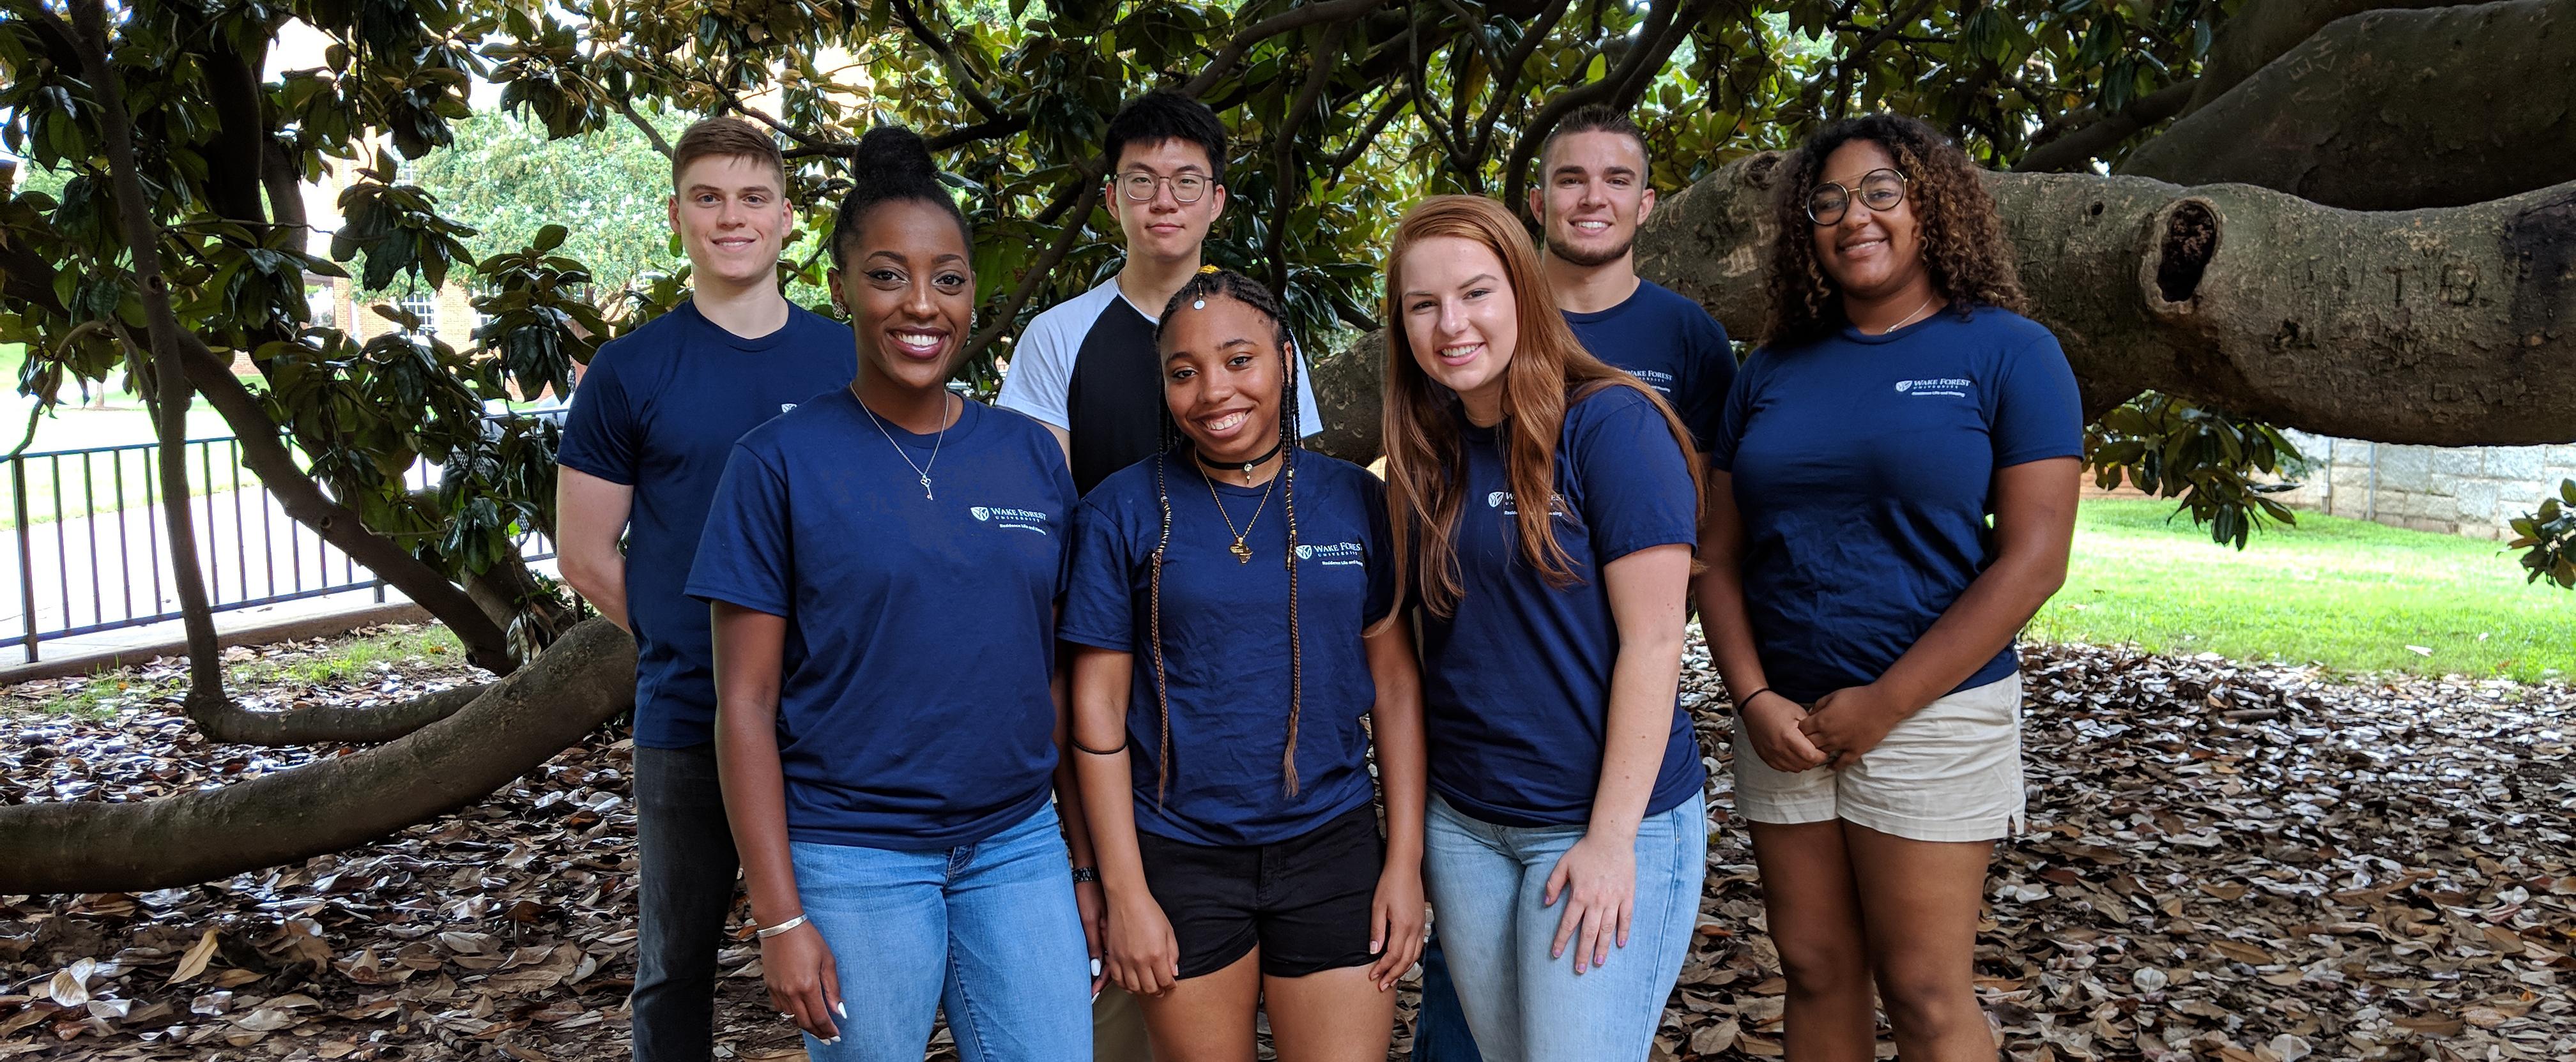 2018-19 South Hall Staff Group Photo